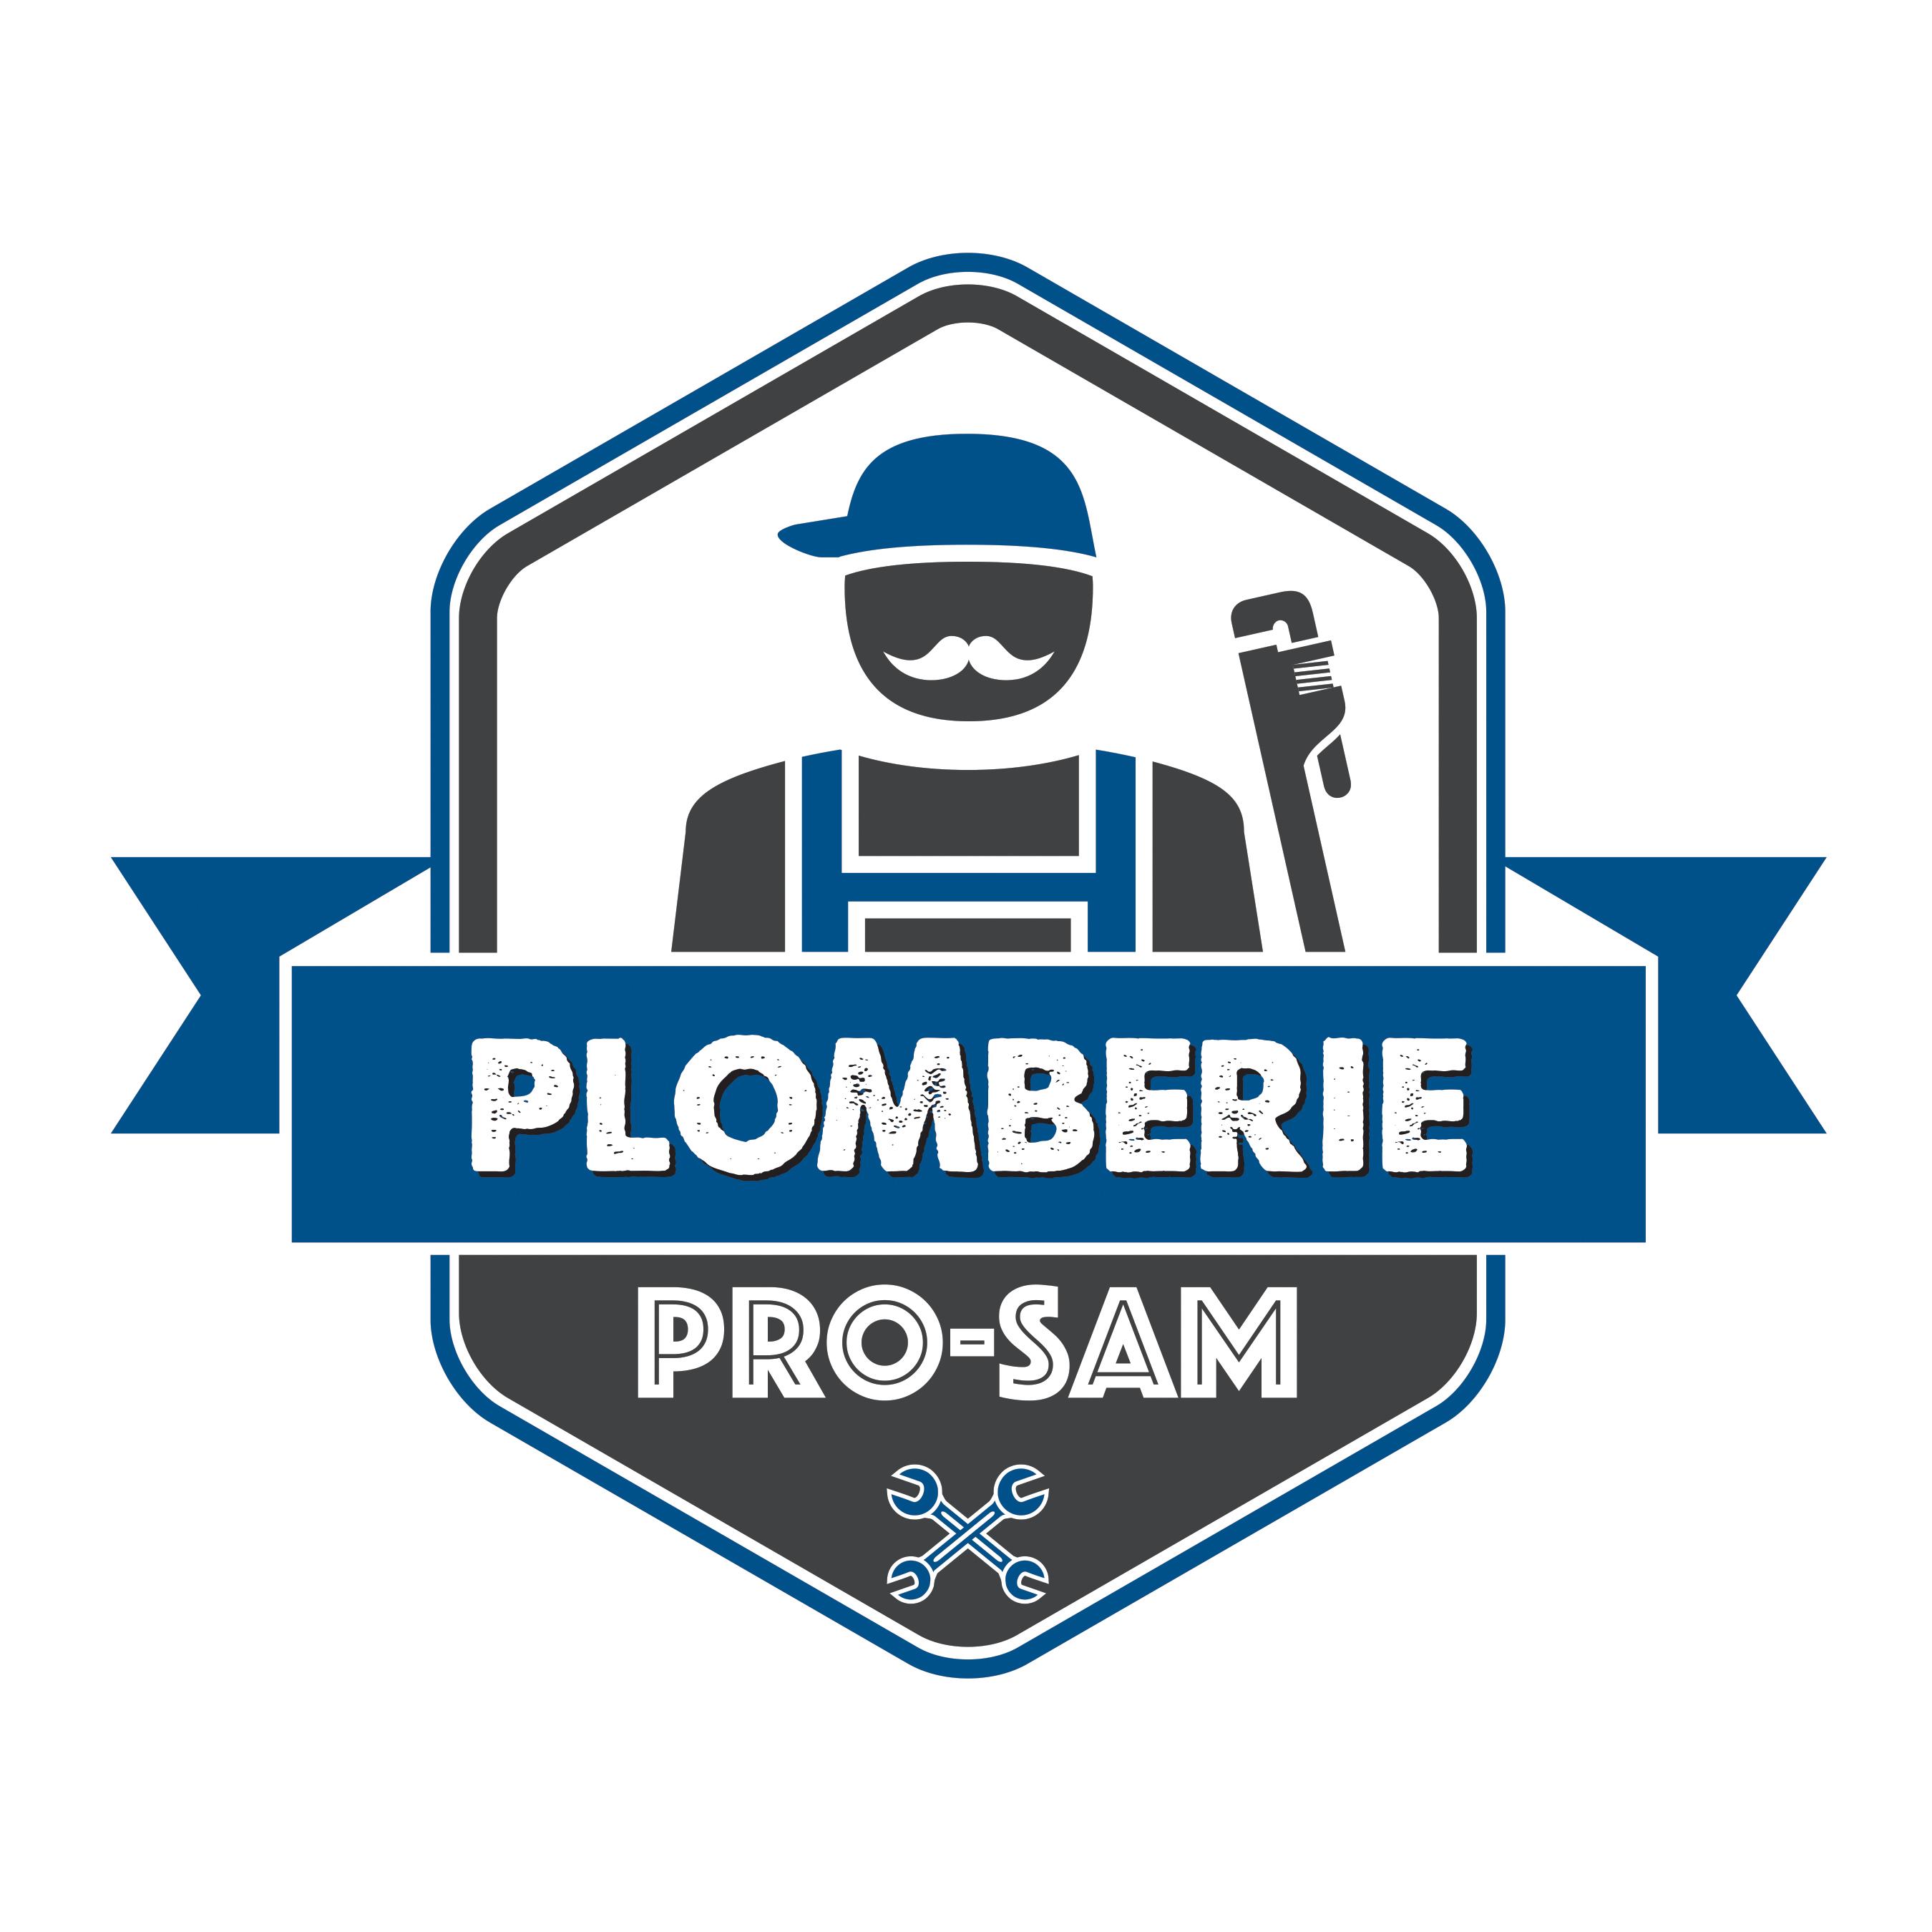 Plomberie Pro-Sam